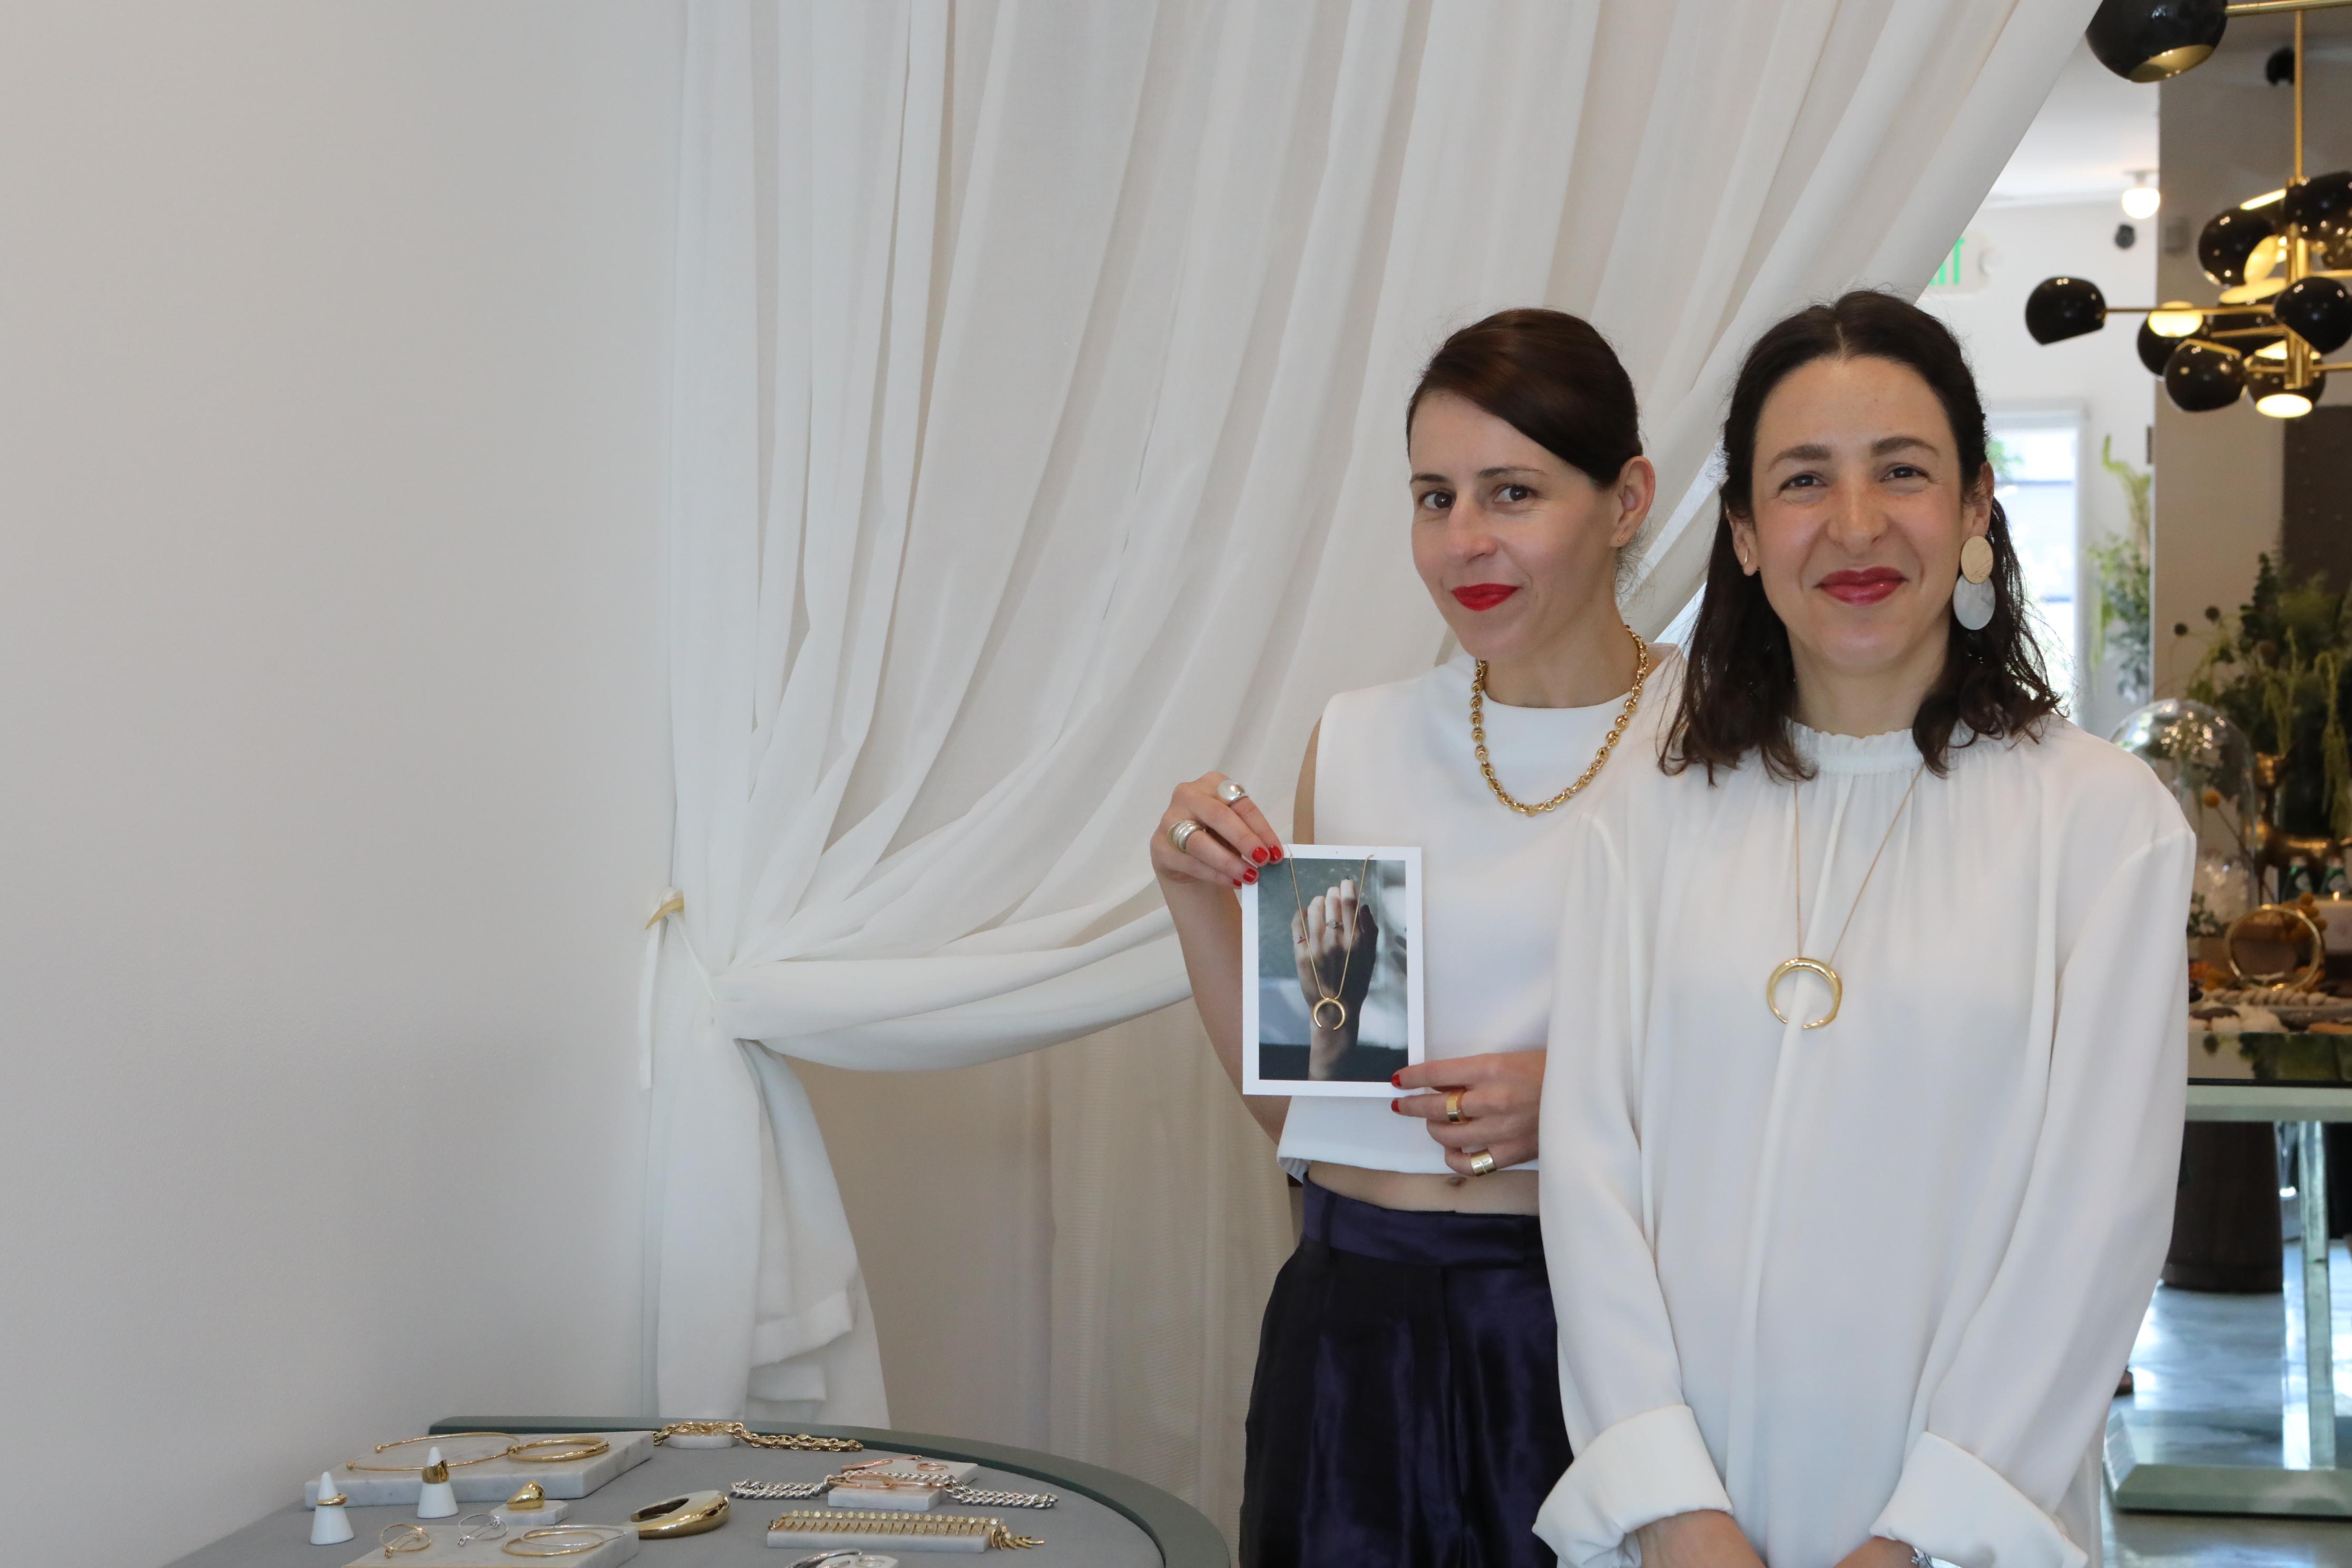 Tere and Gabriela Artigas in the Los Angeles boutique